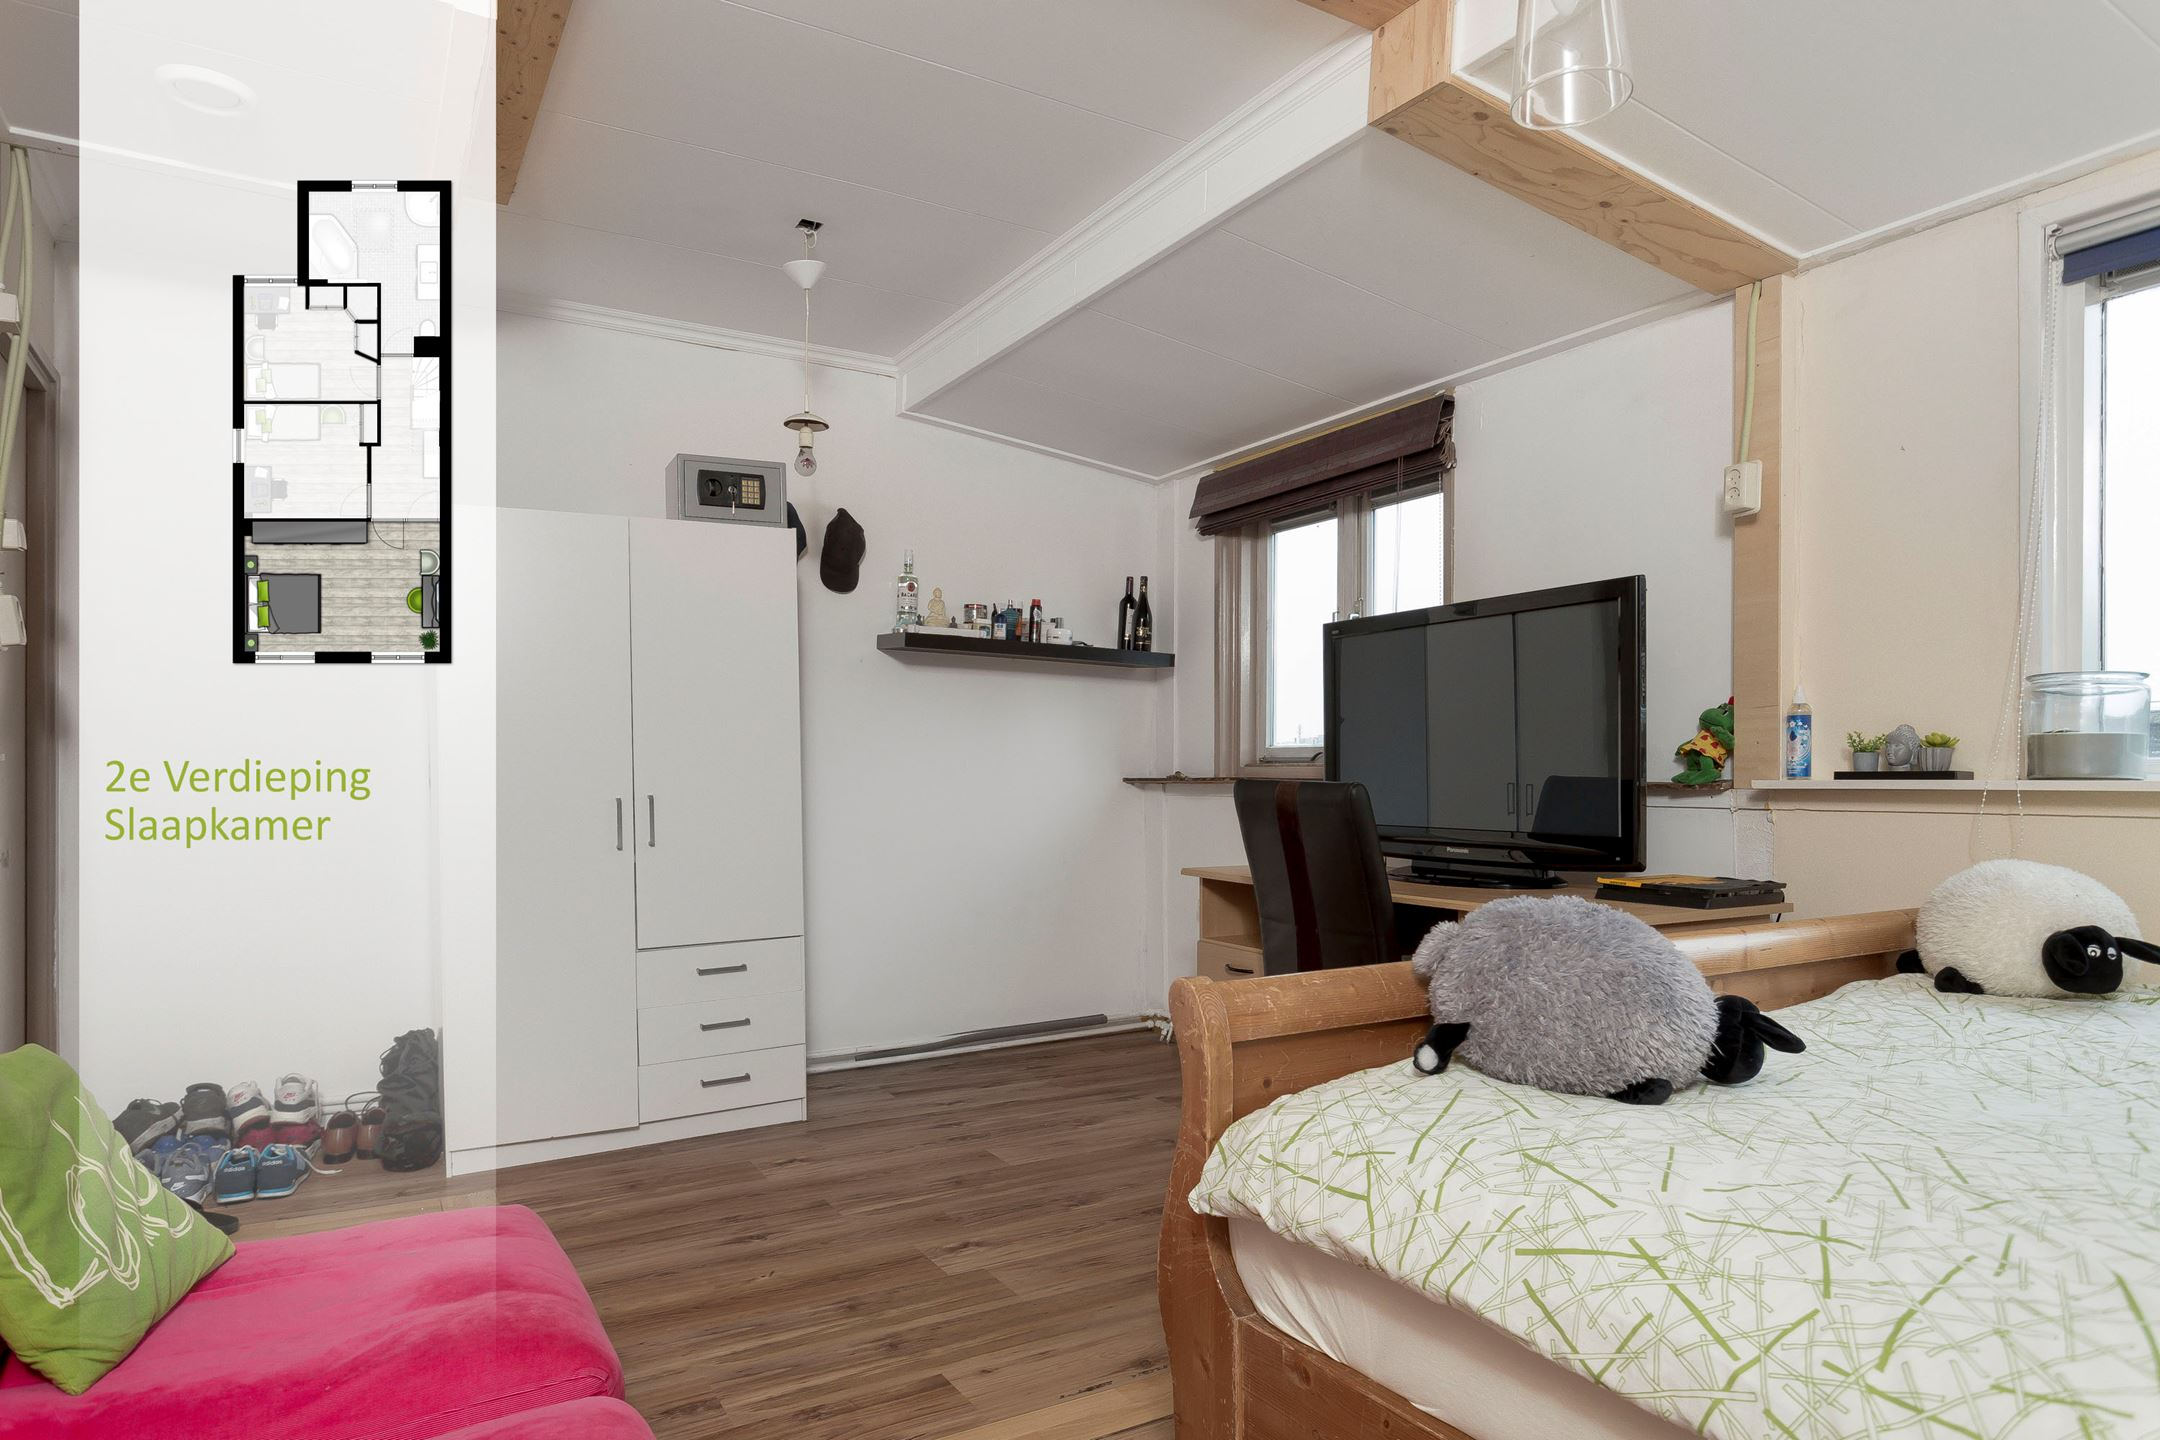 Beautiful Slaapkamer Zandkleur Images - Huis & Interieur Ideeën ...